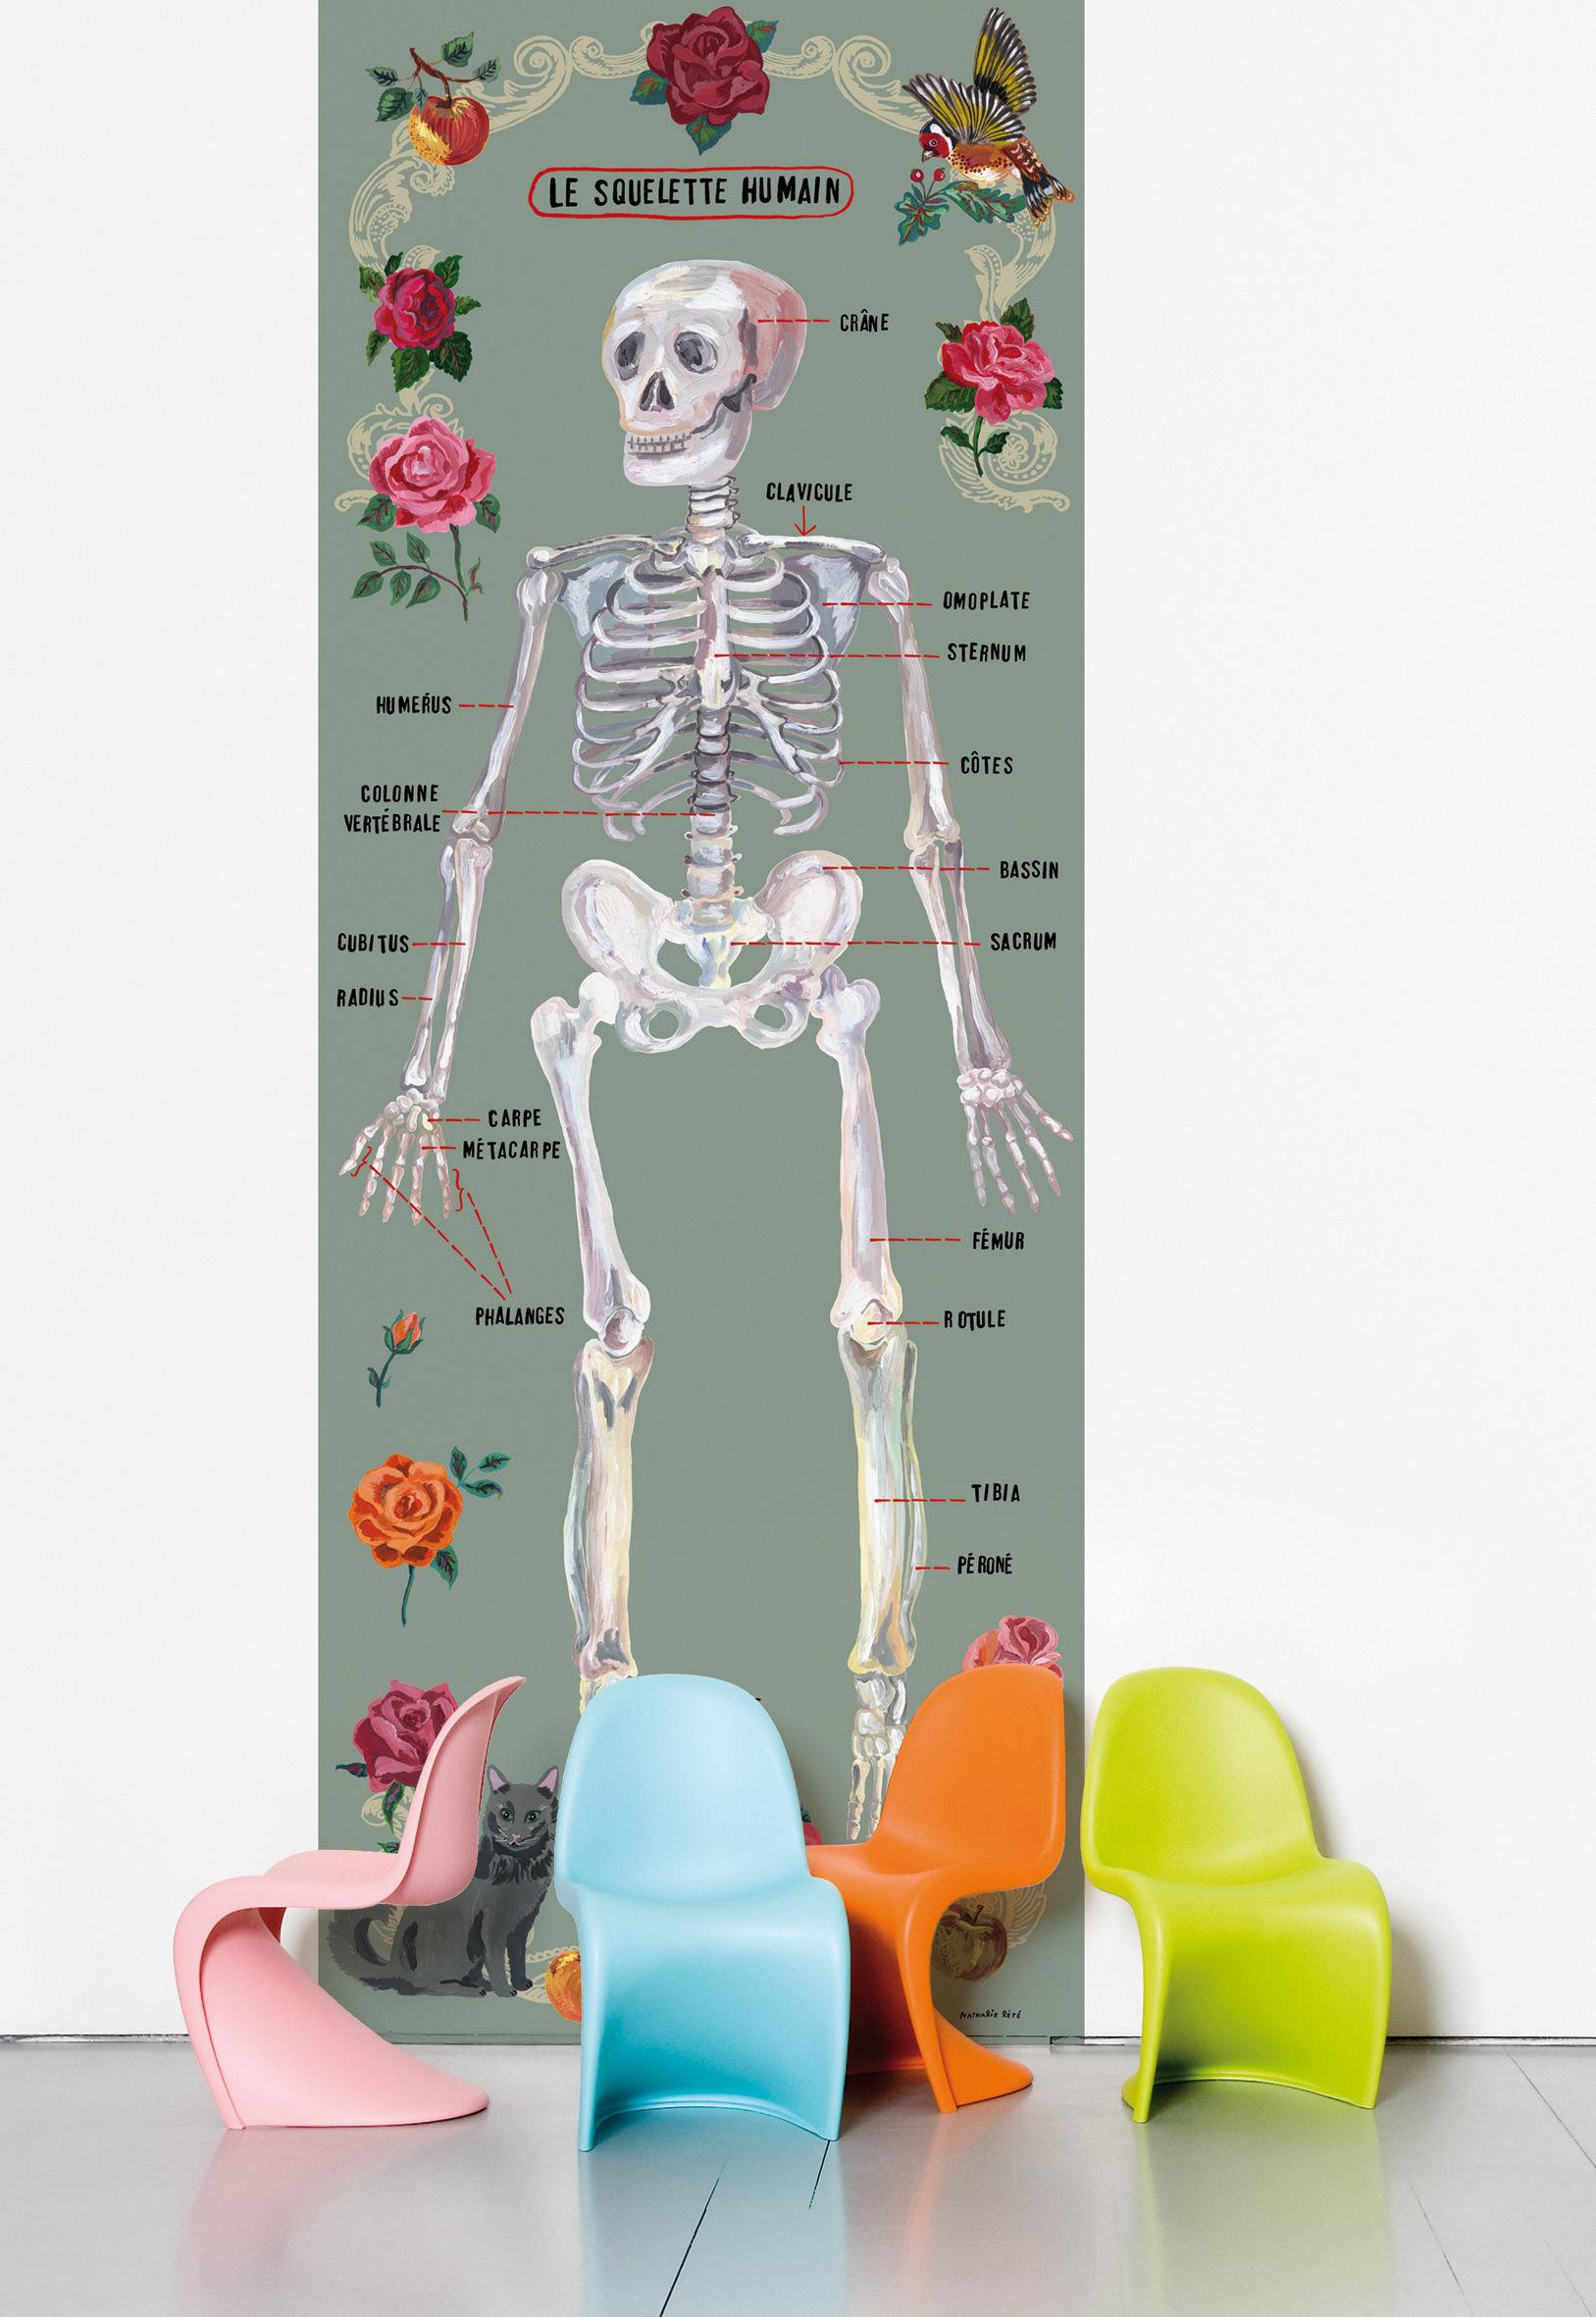 Dekoration - Stickers und Tapeten - Le squelette humain Tapete - Domestic - Mehrfarbig - Skelett - imprägniertes Papier